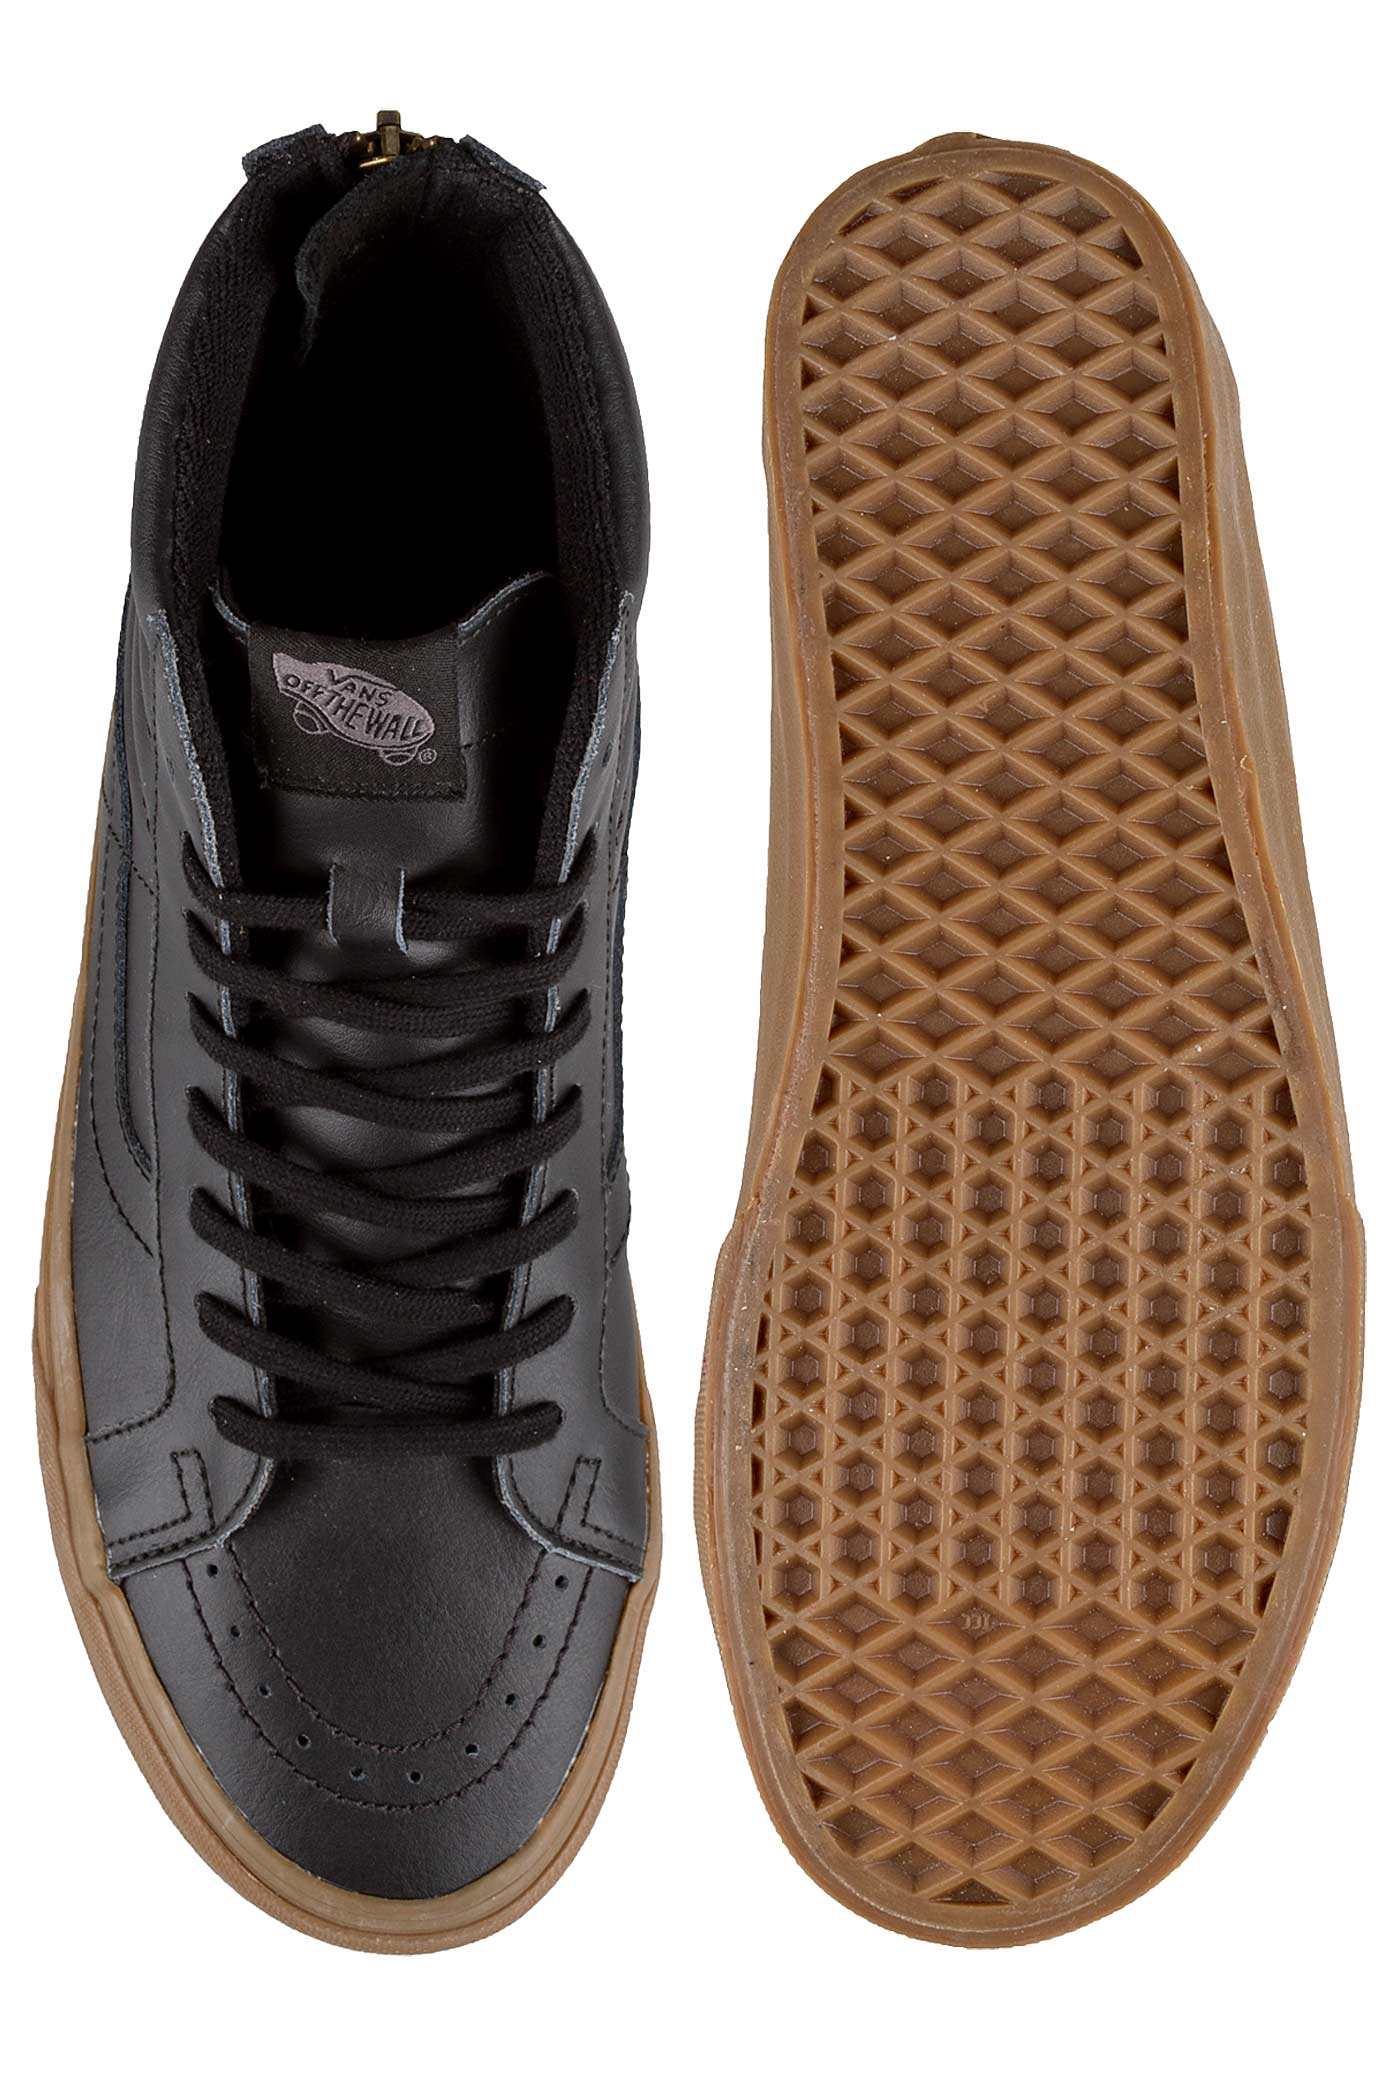 25f98afb8e5fe2 Vans - Vans Sk8-Hi Reissue Zip Hiking Navy   Gum Ankle-High Skateboarding  Shoe - 10M 8.5M - Walmart.com